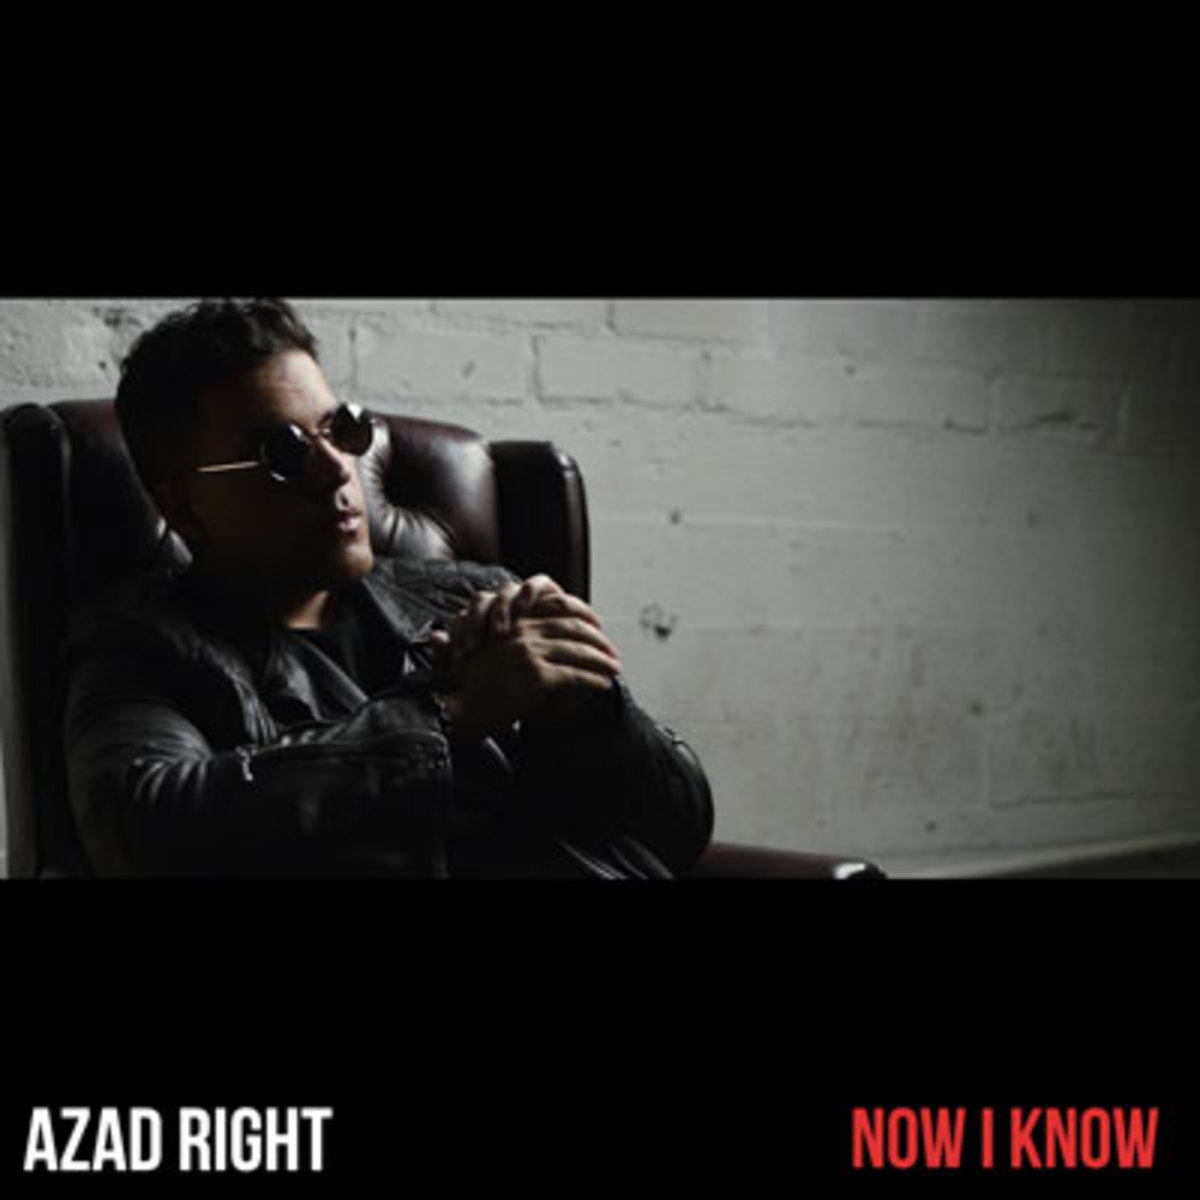 azadright-nowiknow.jpg